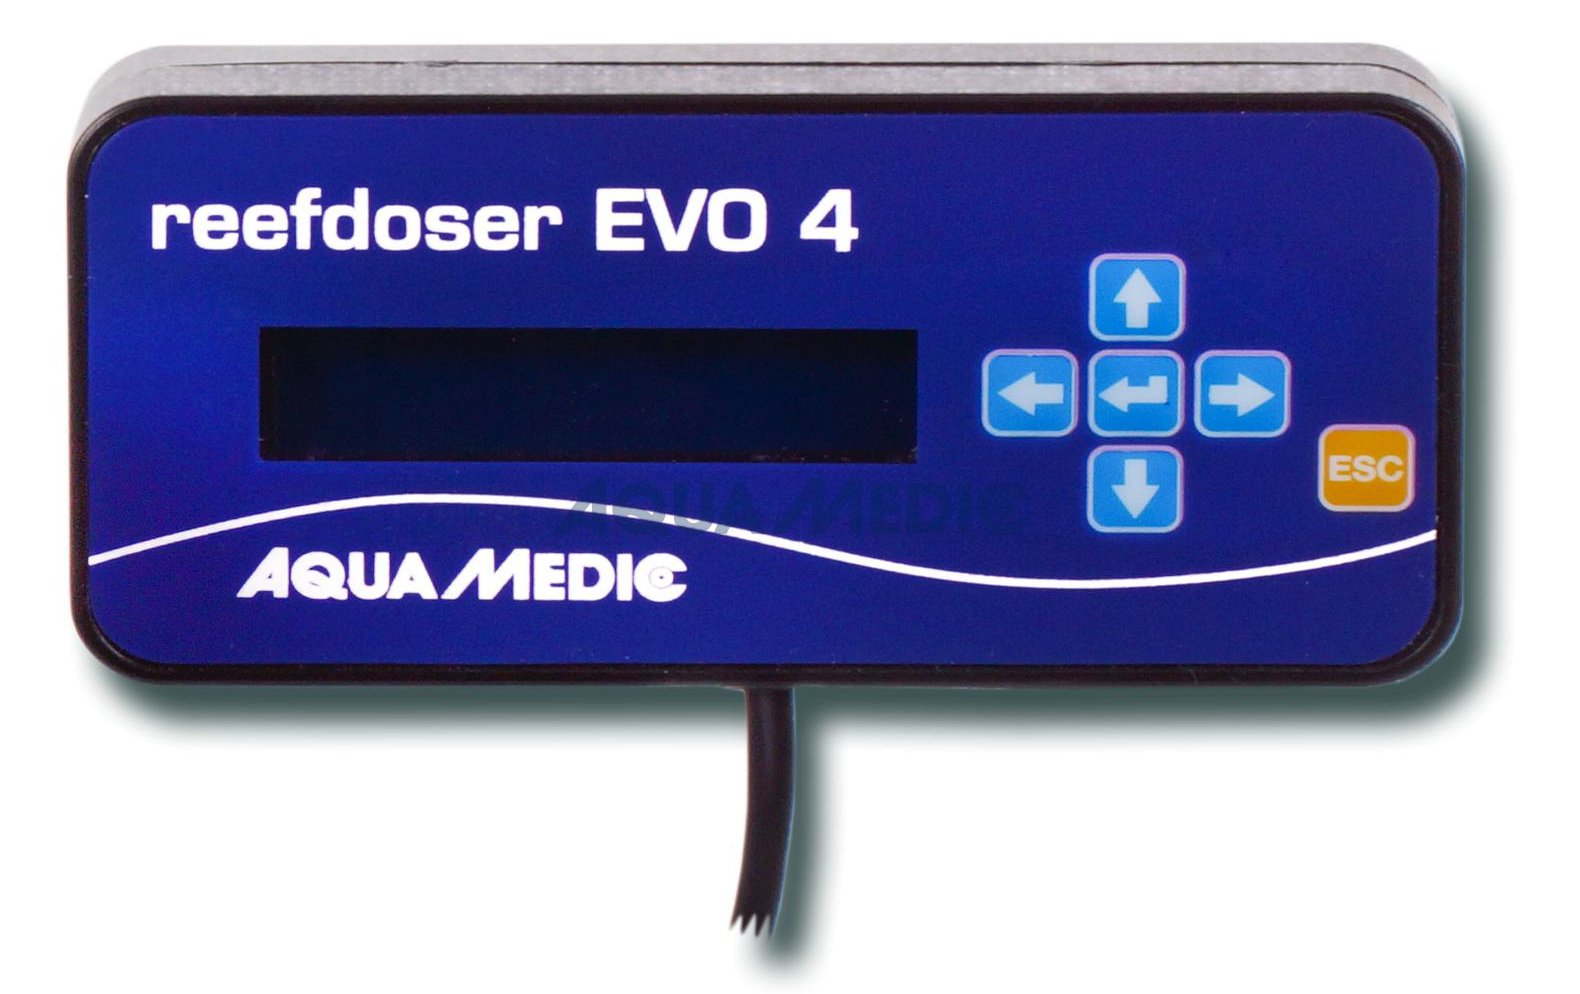 Preise Aqua Medic Dosierpumpe reefdoser EVO 4